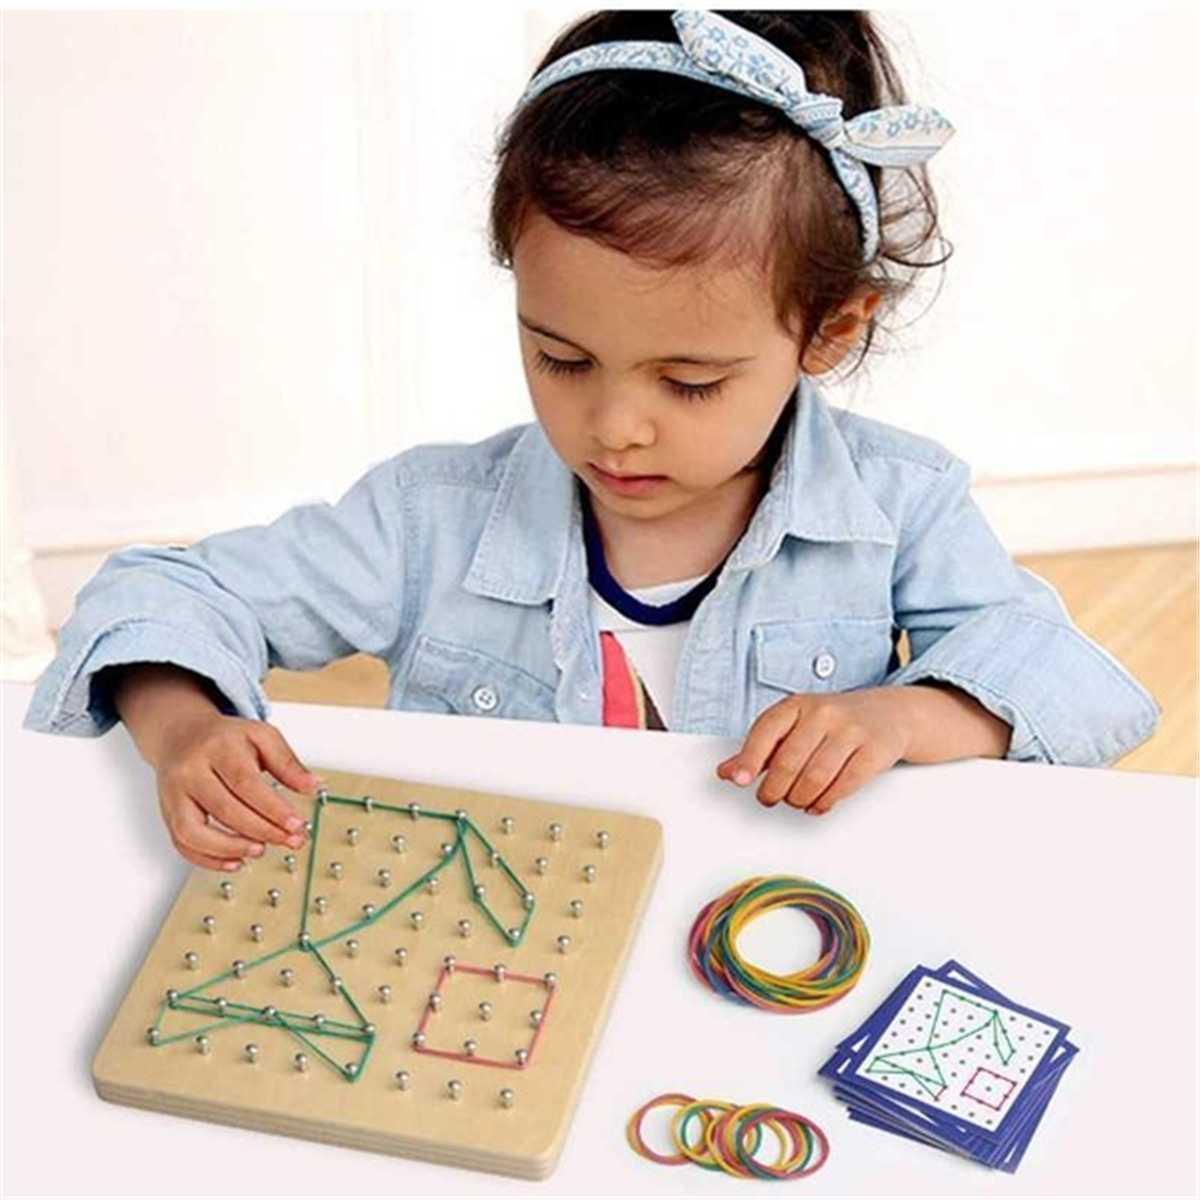 17.8*17.8cm Children Wooden Montessori Shape Boards Match Shape Toys Early Fine Motor Skills Development Sensorial Education